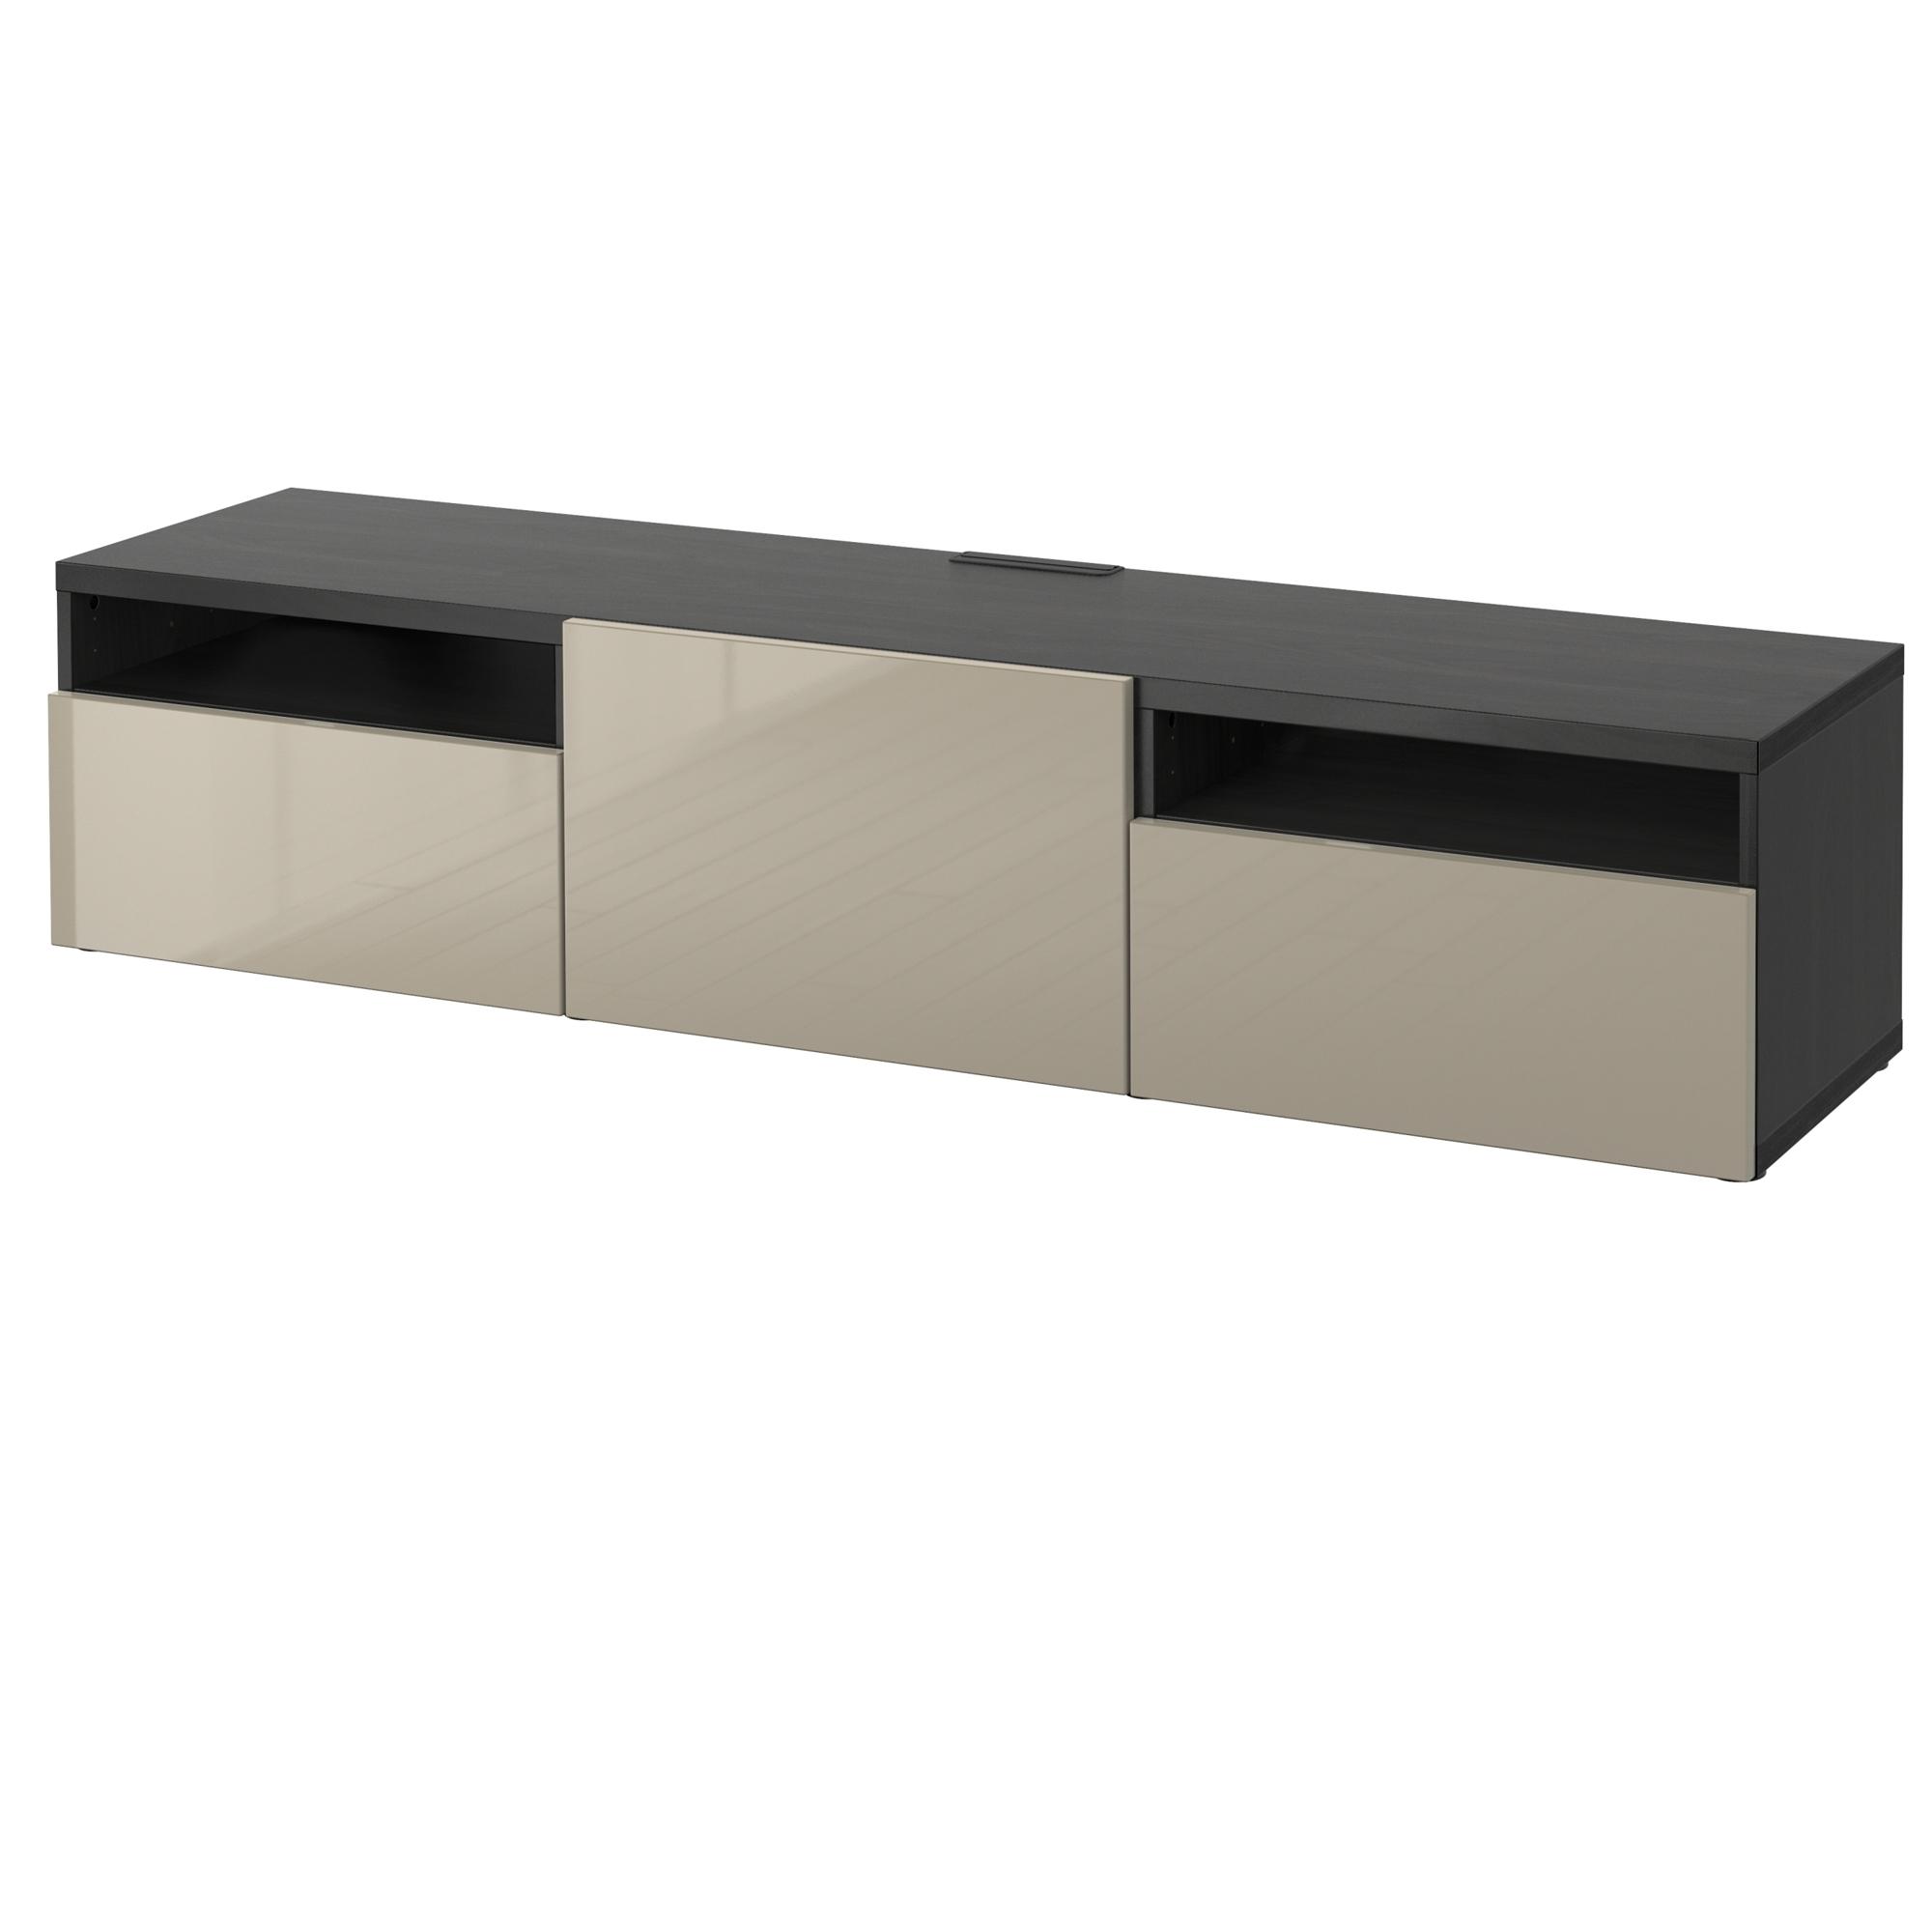 Mueble besta de almacenaje para sal n ikea pictures to pin - Ikea almacenaje salon ...